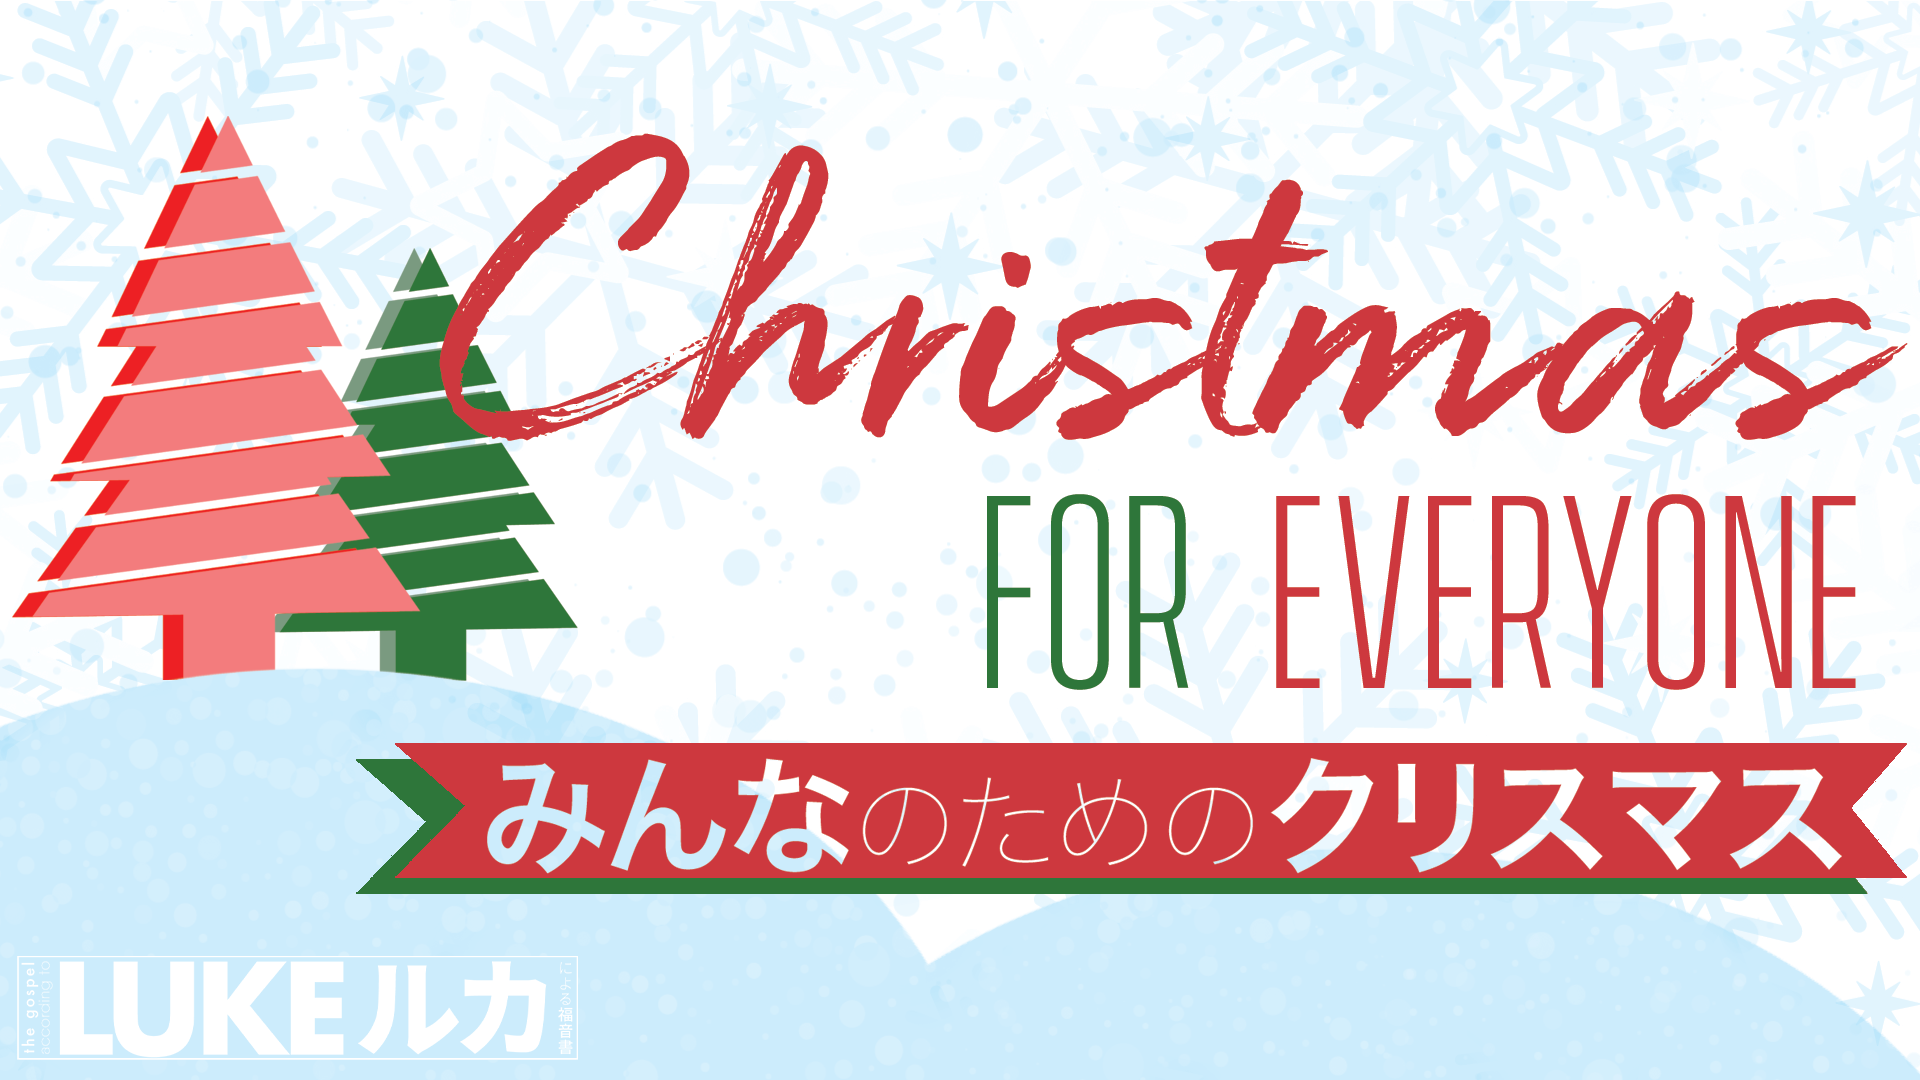 Christmas w Luke logo.png